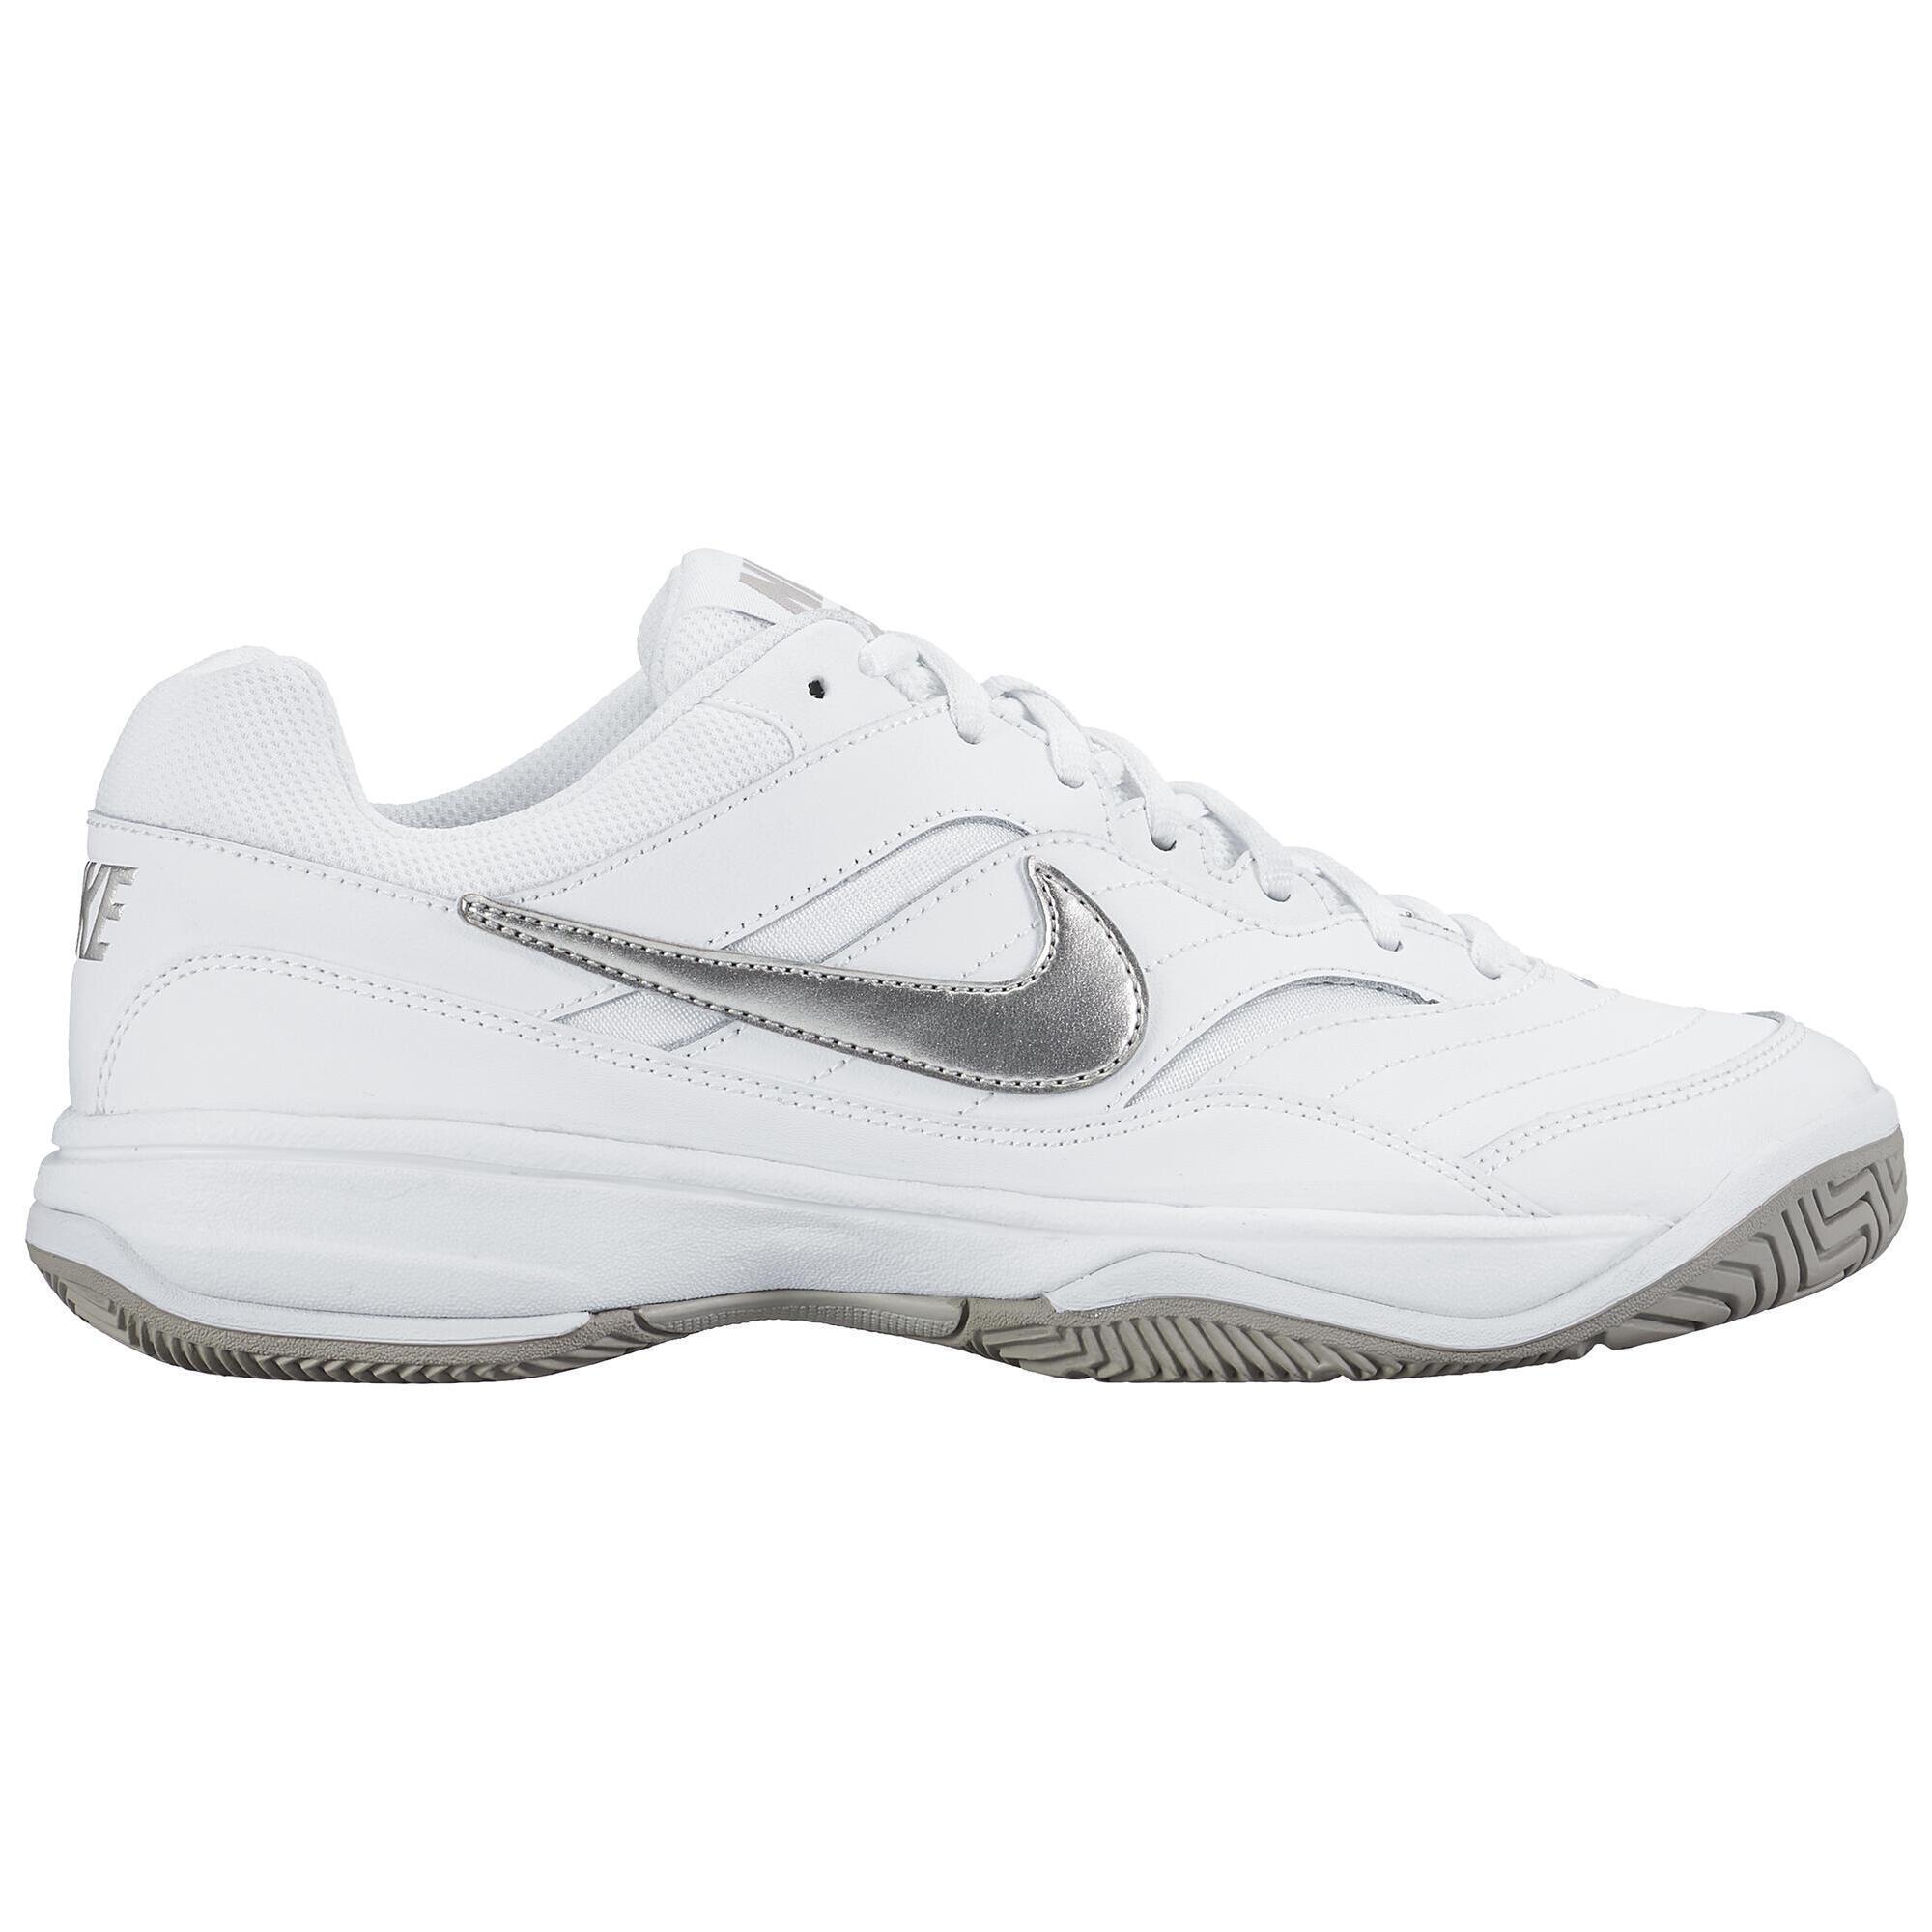 Nike Tennisschoenen dames Court Lite wit